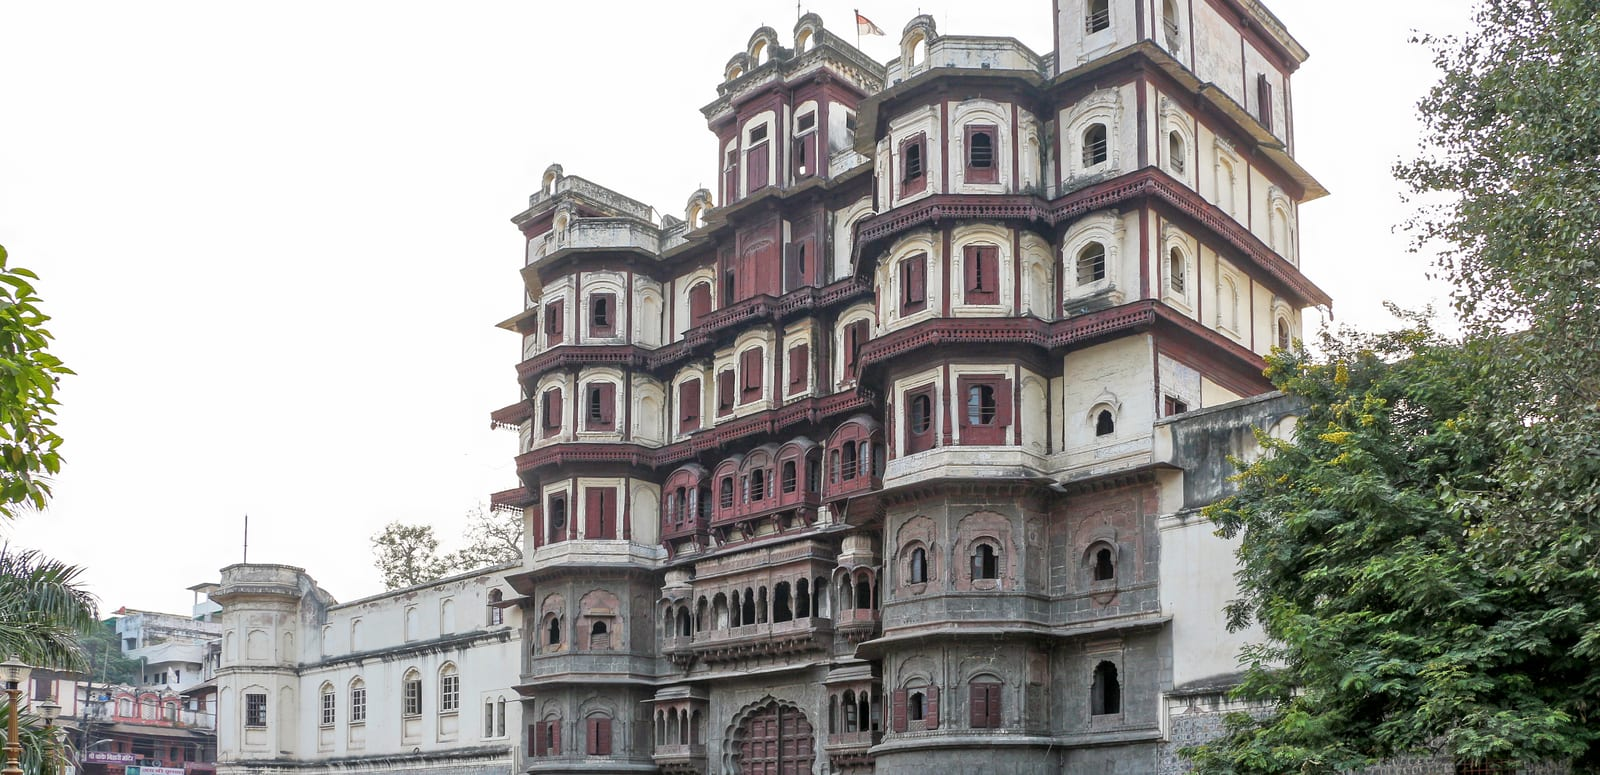 1493466584_rajwada_palace__indore.jpg